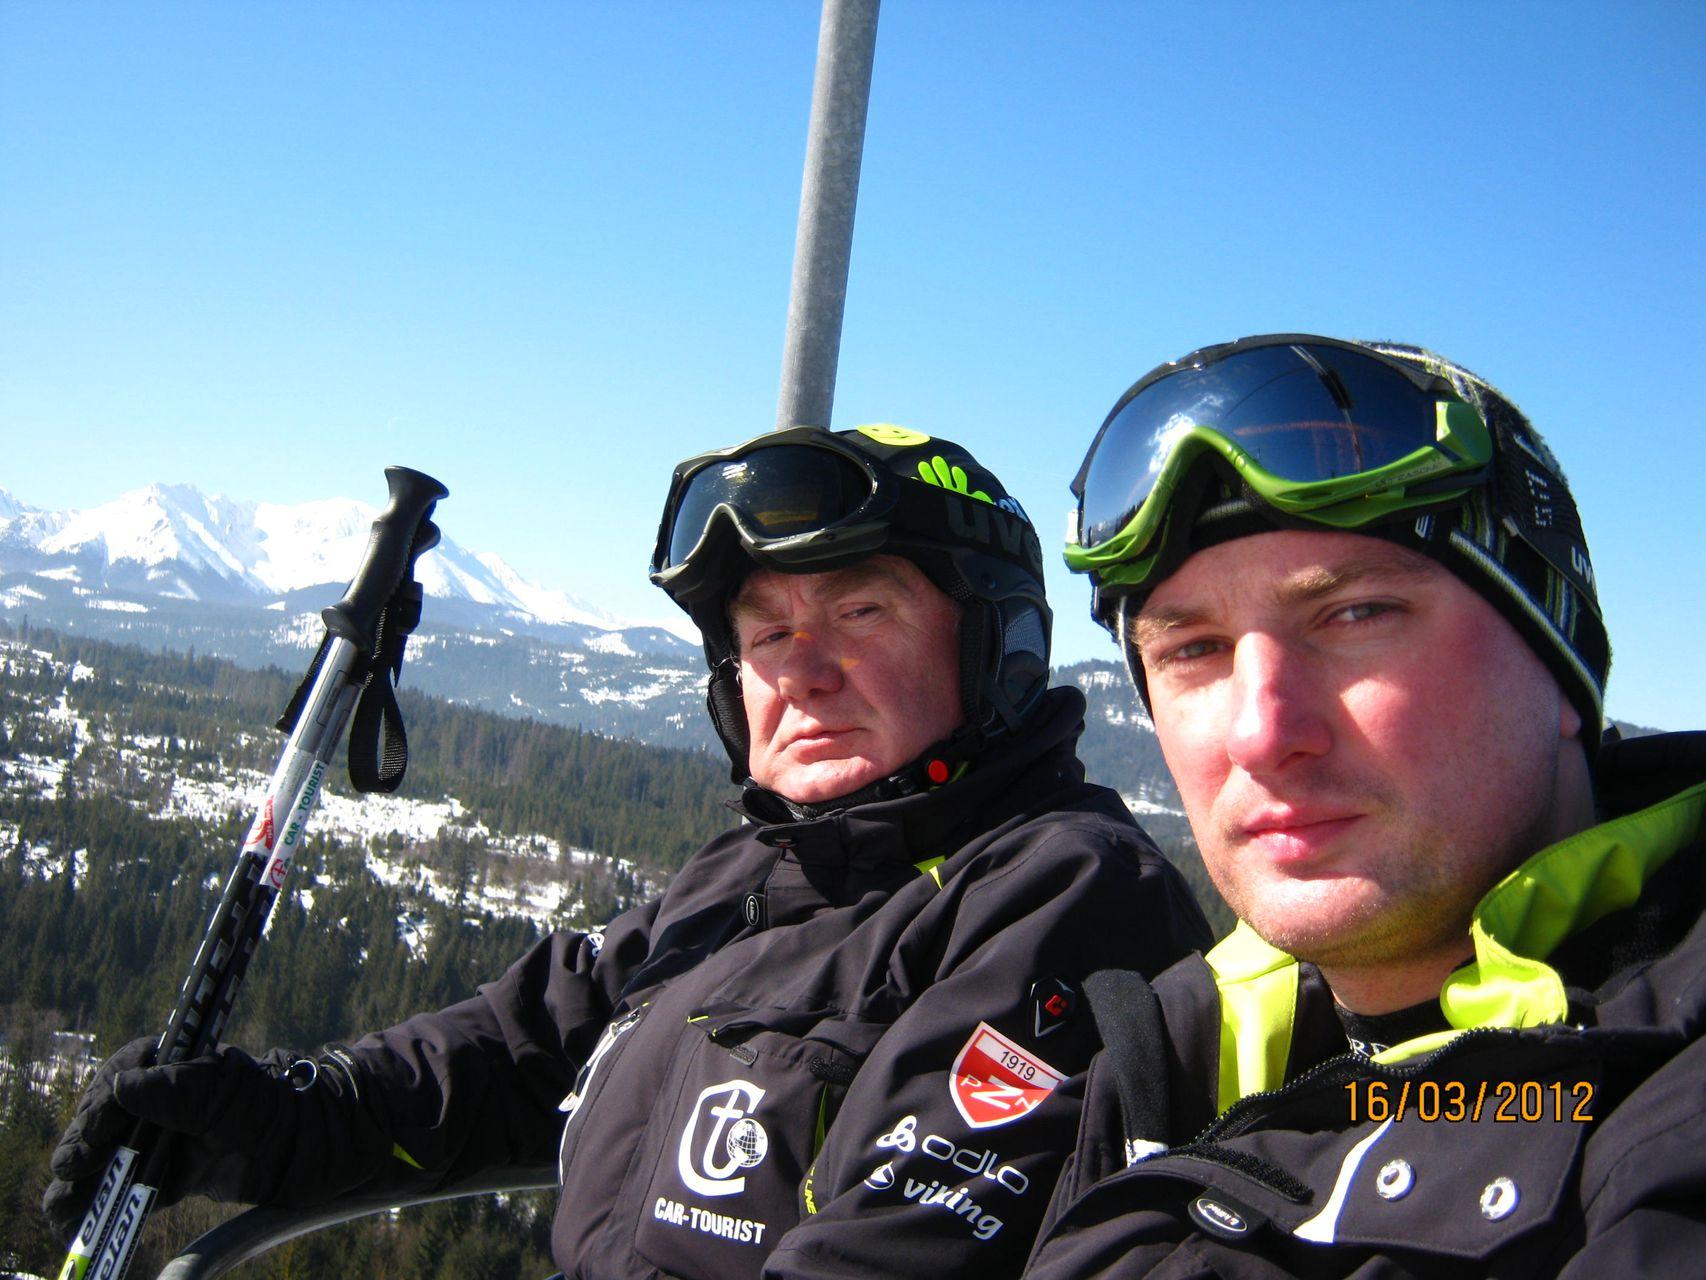 CarTourist_narty-snowboard_2012-foto-3